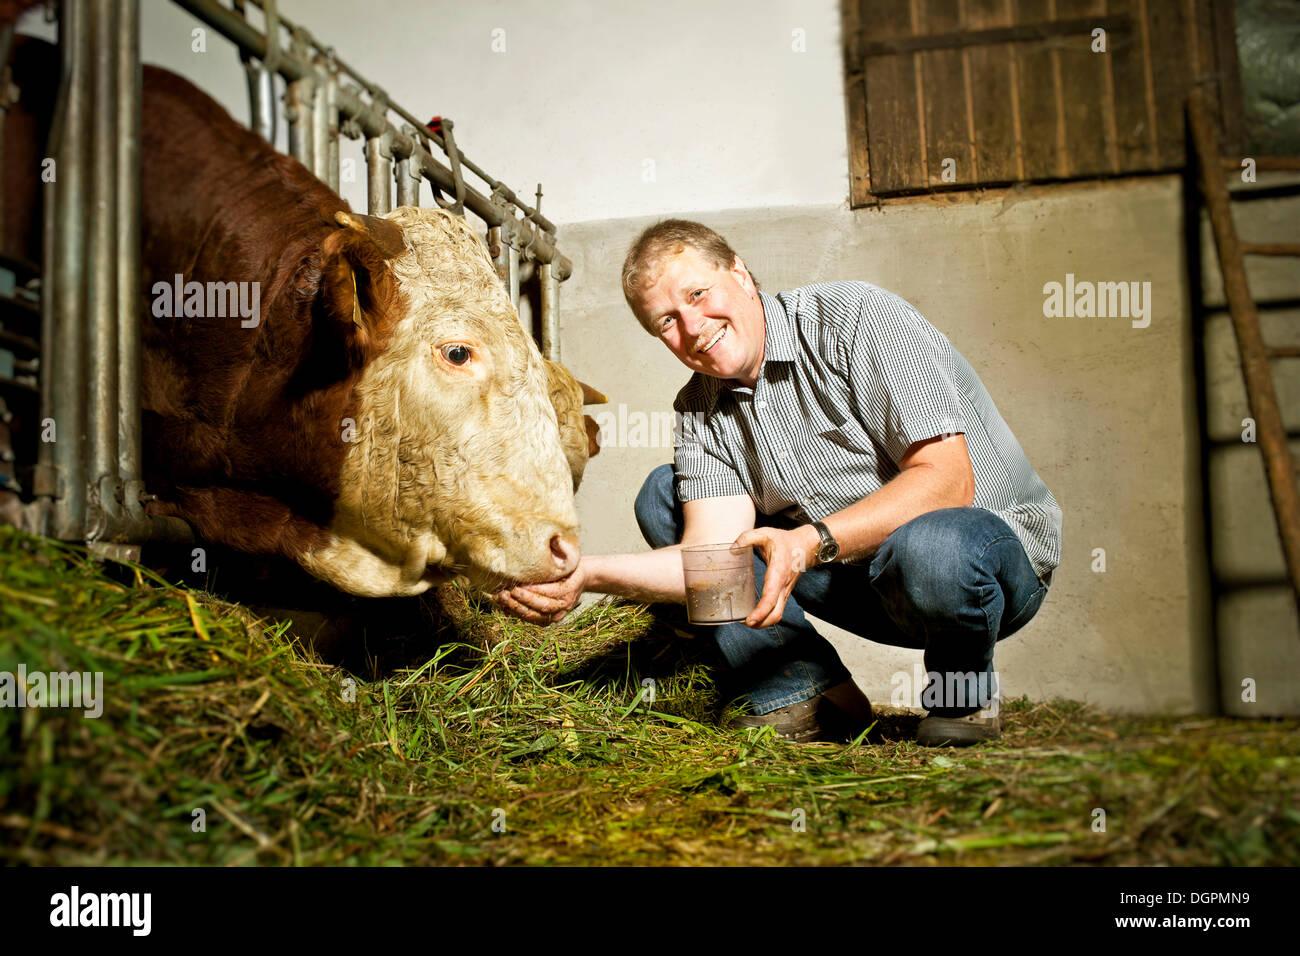 Agricultor alimentar un toro Imagen De Stock